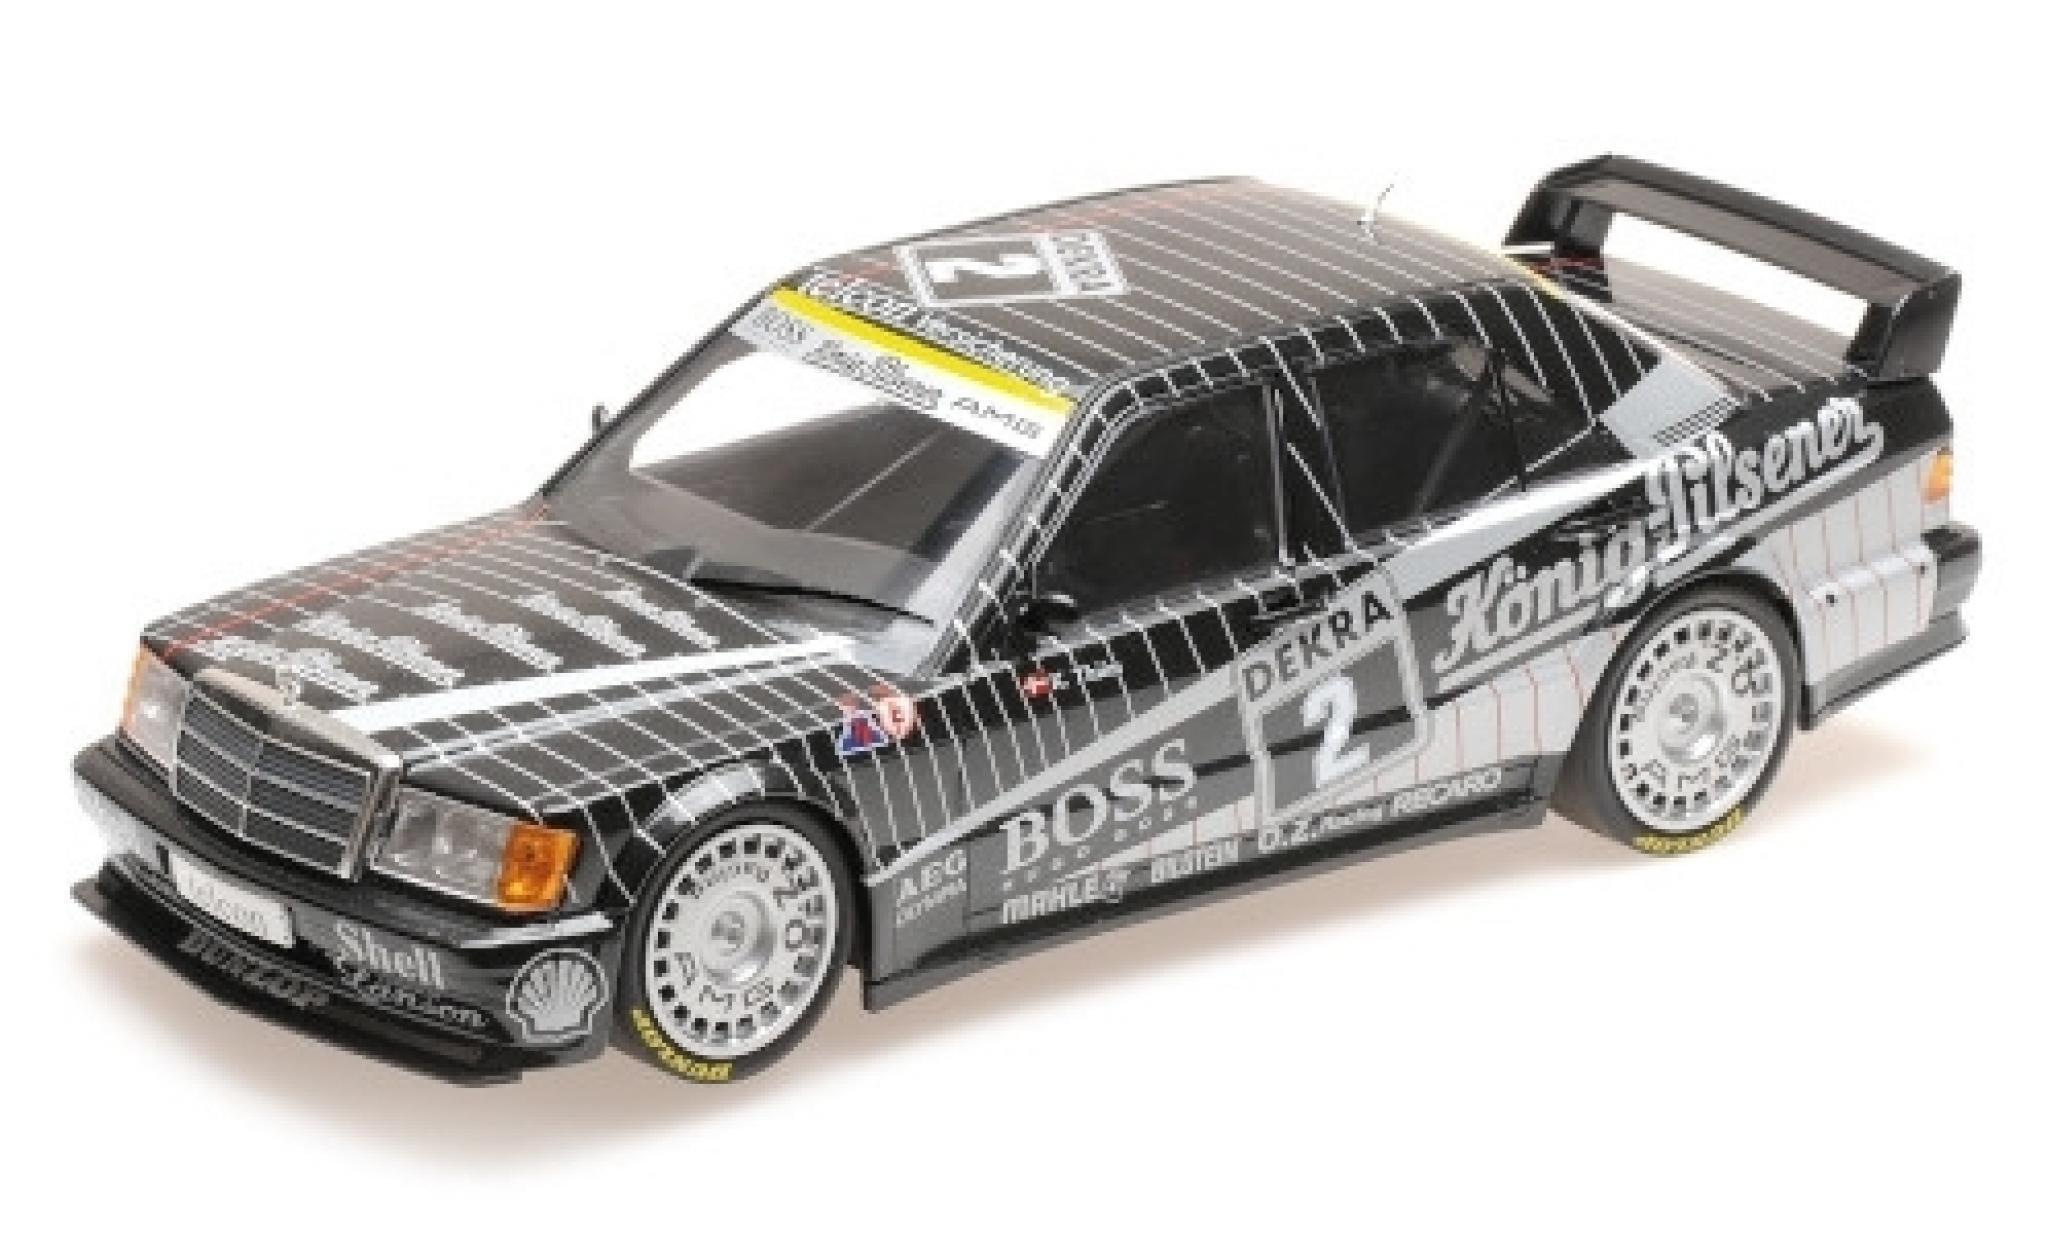 Mercedes 190 1/18 Minichamps E 2.5-16 Evo 1 No.2 AMG Boss / König-Pilsener DTM 1989 K.Thiim